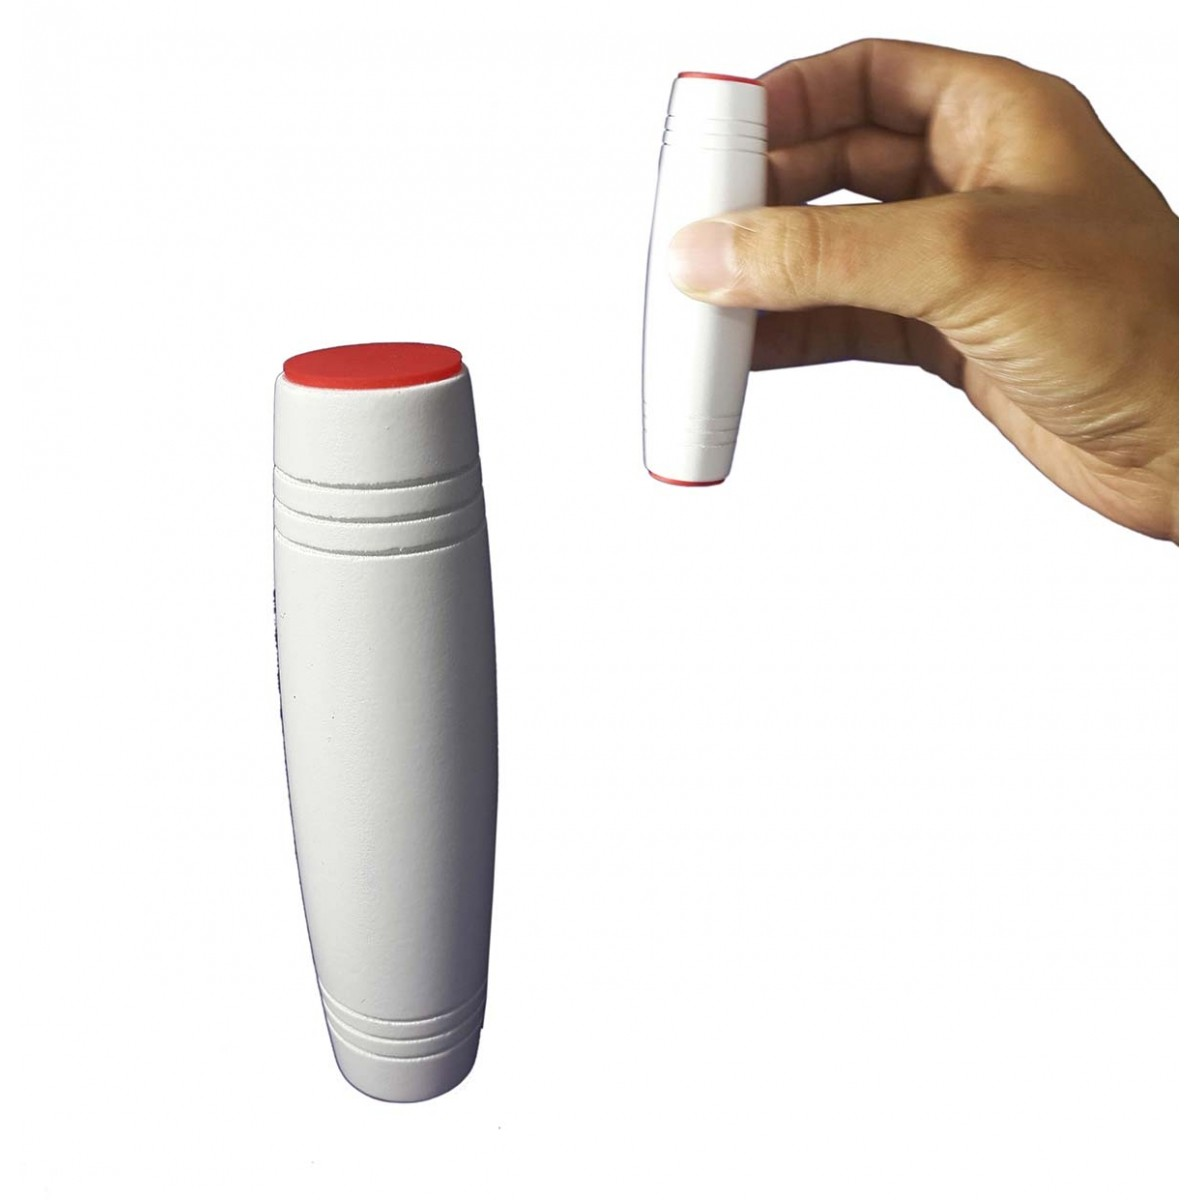 Fidget Mokuru Stick Bastao Magico Roller Brinquedo Toy Ansiedade Anti Stress Branco (bsl-gira-4 mokuru)